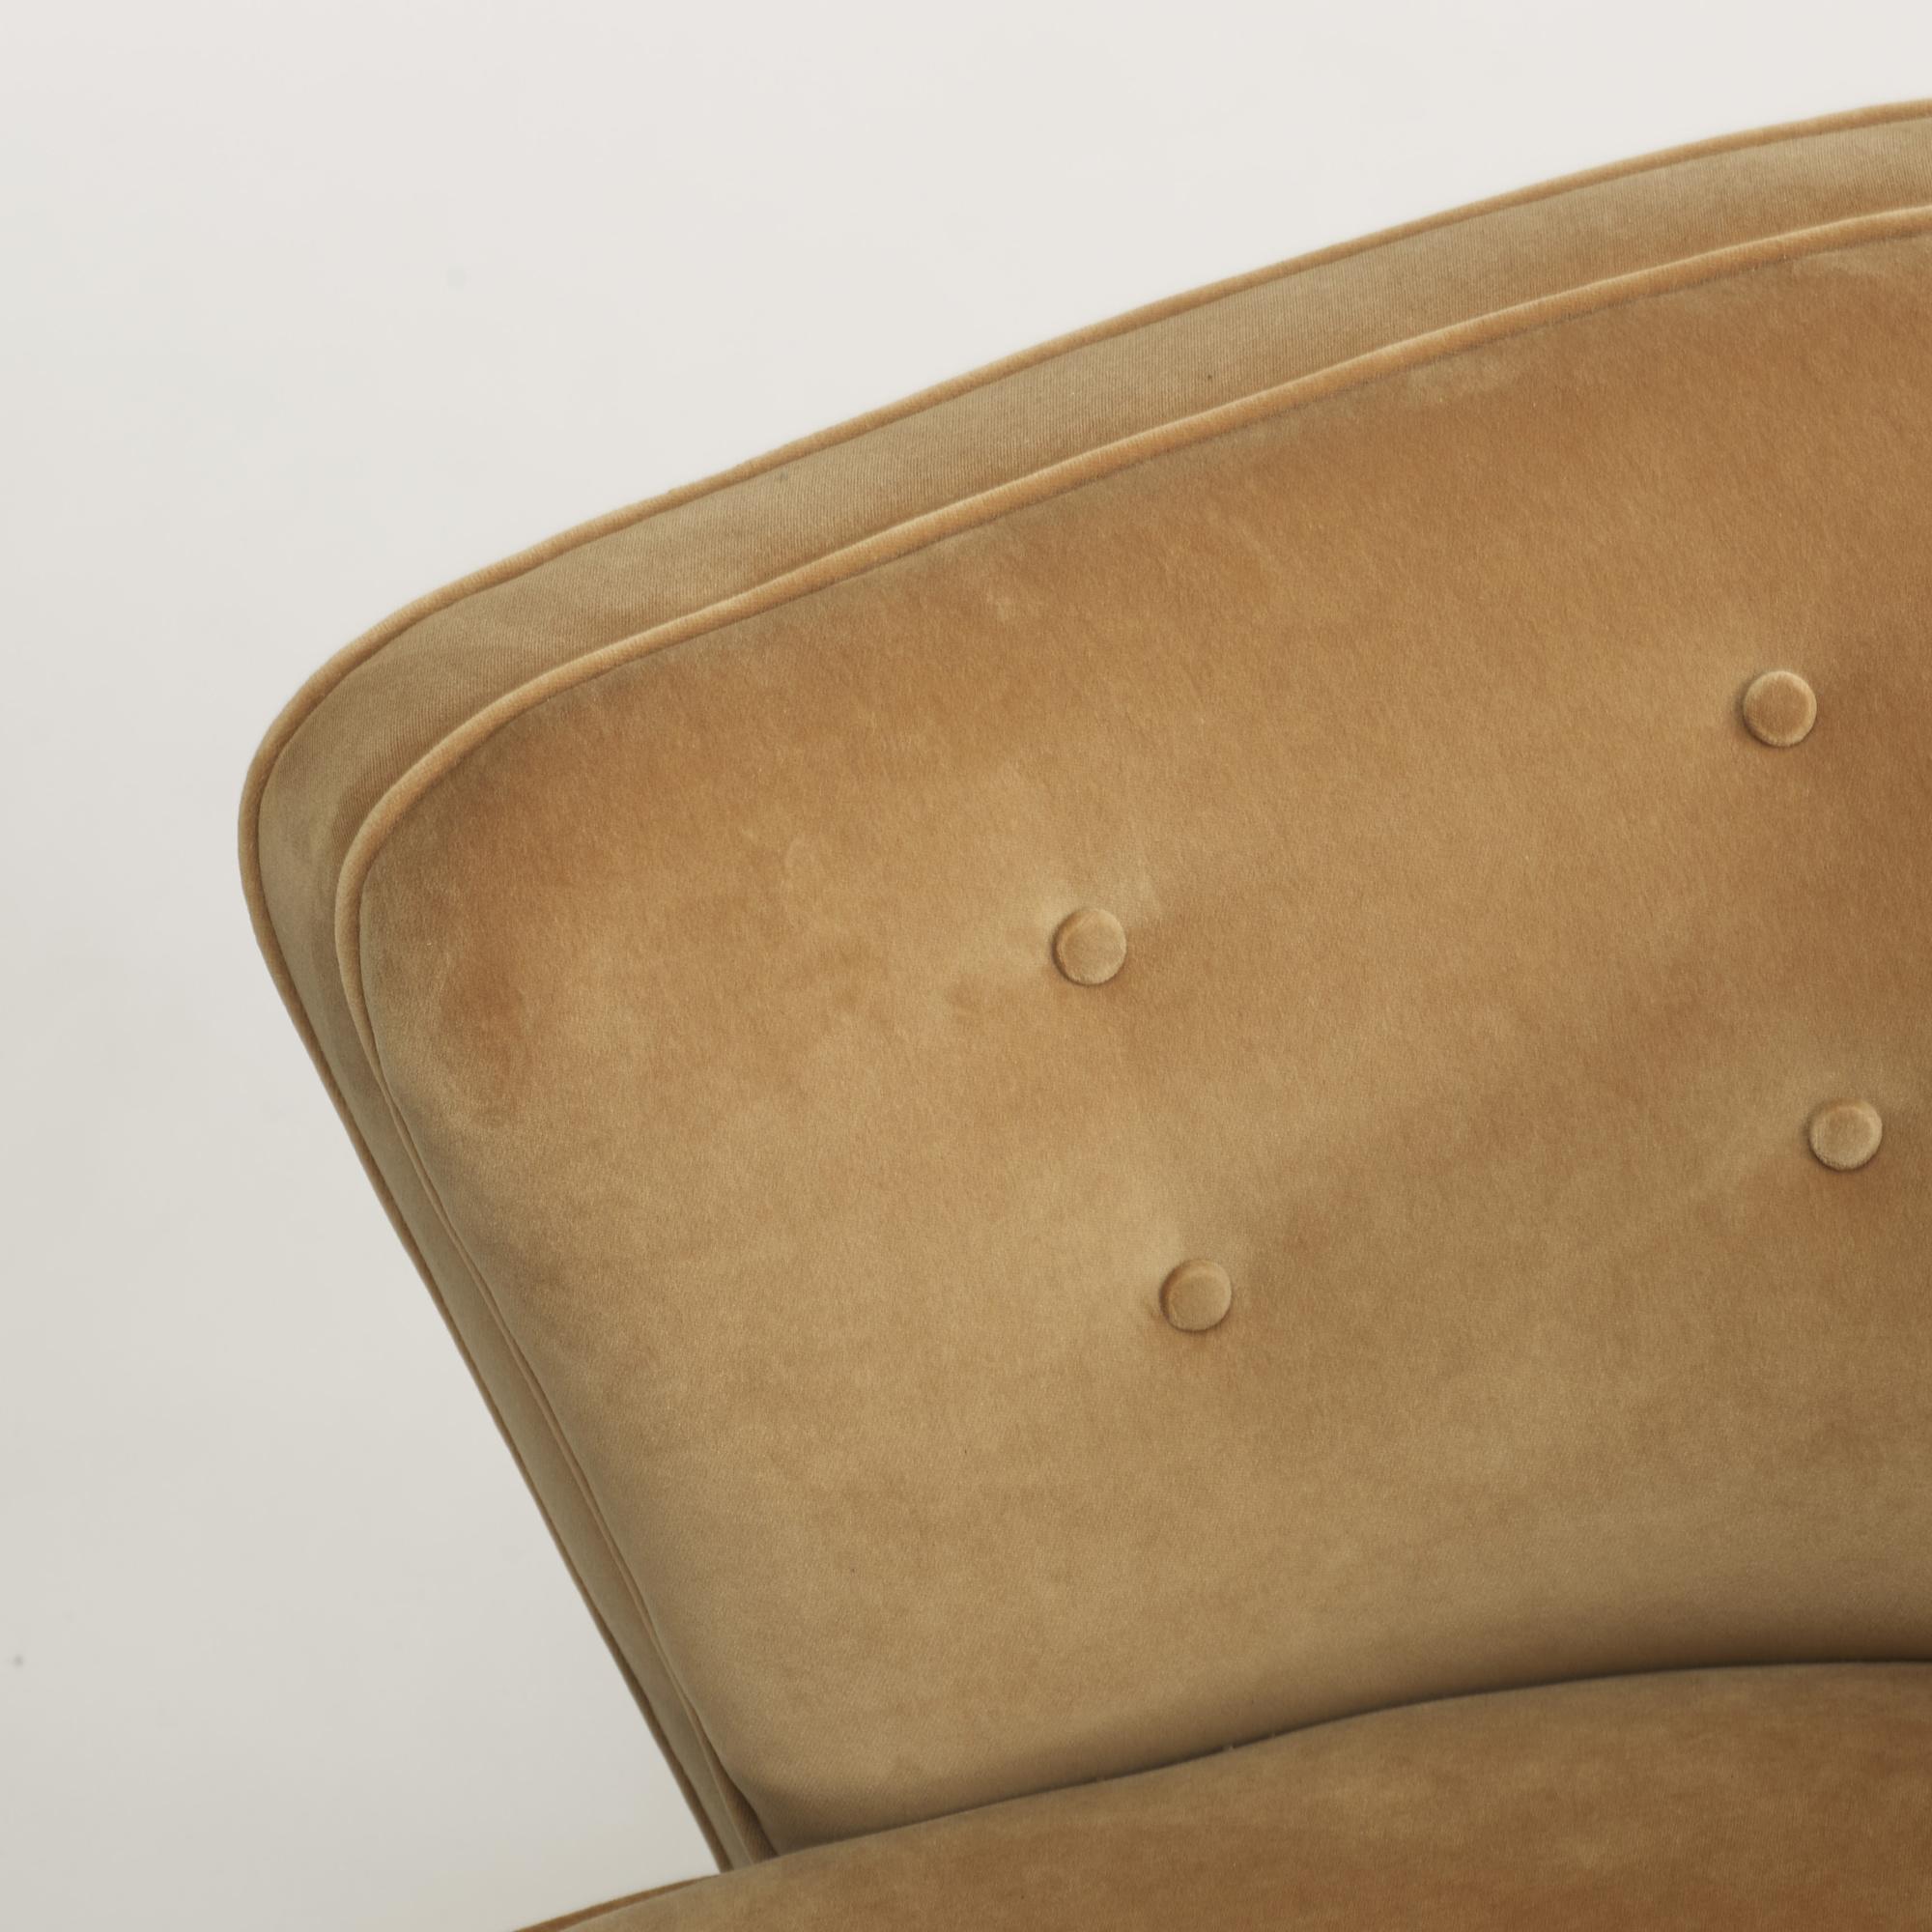 111: Danish Cabinetmaker / lounge chairs, pair (4 of 4)